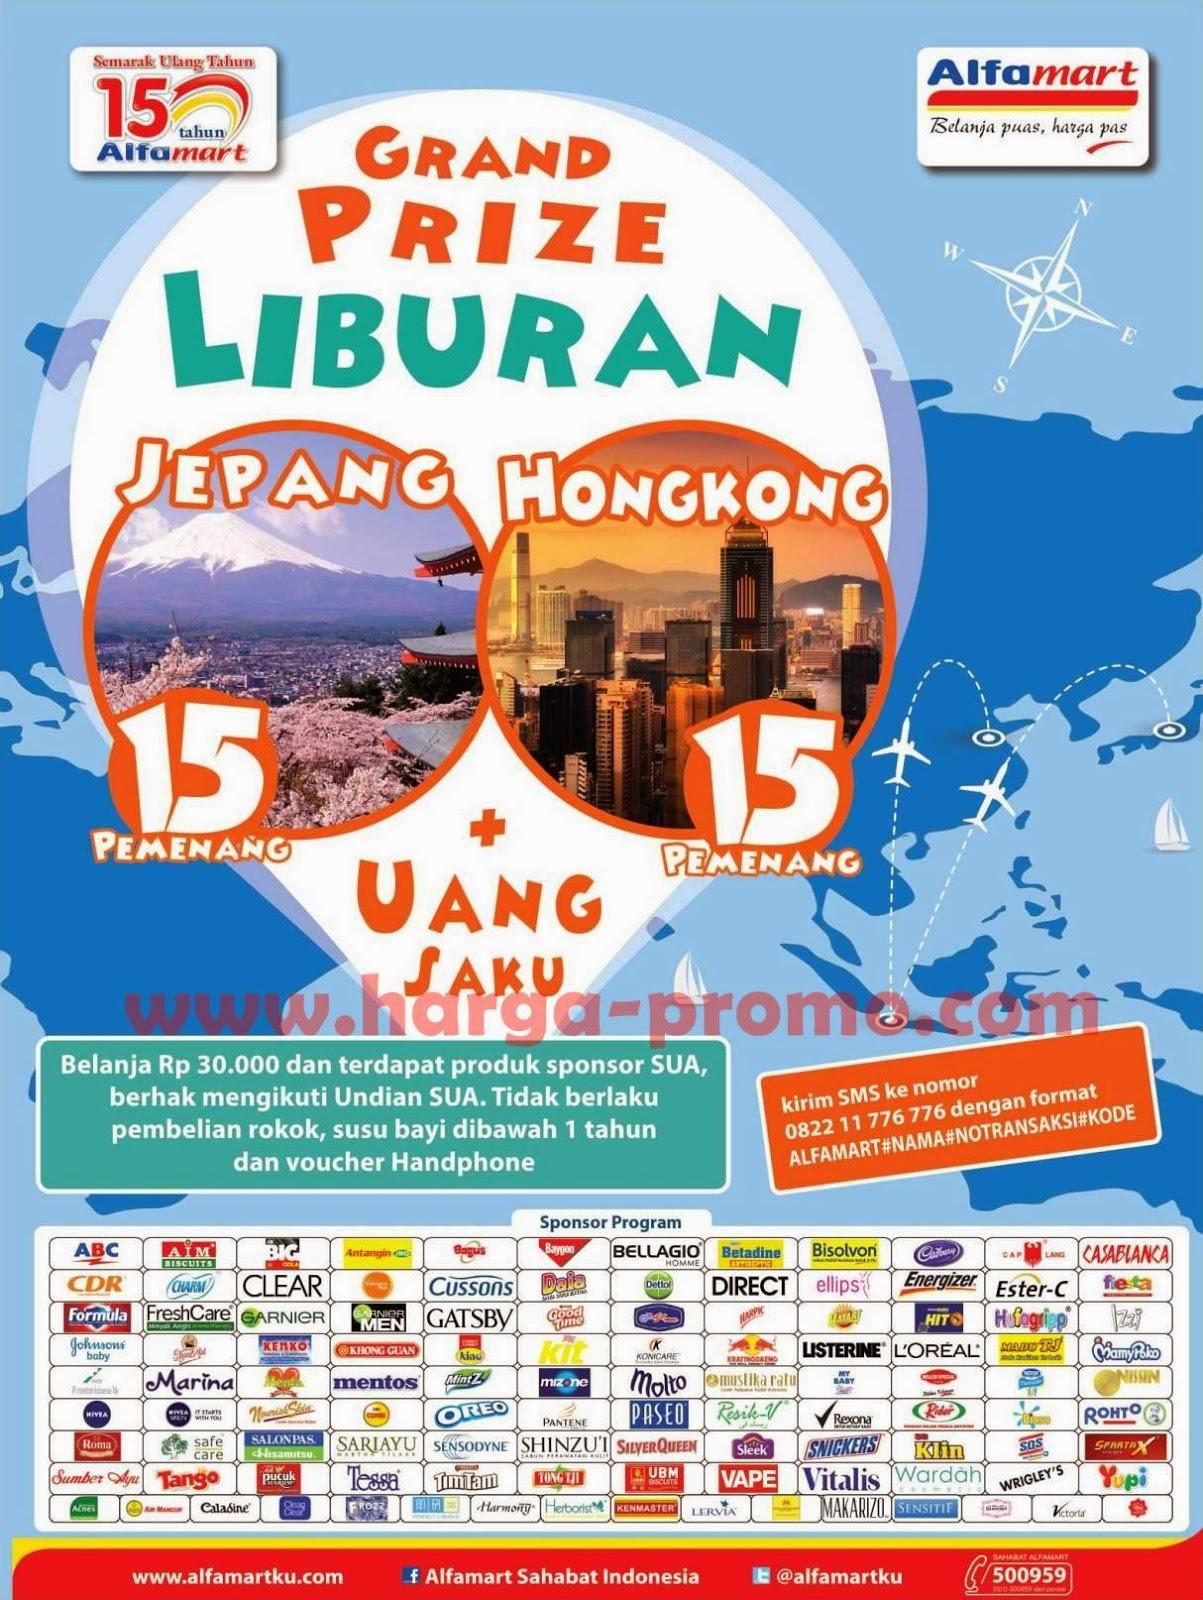 Promo Alfamart 2013 Katalog Harga Promo Jsm Alfamart Akhir Pekan 12 14 Harga Promo Katalog Alfamart Promo Alfamart Terbaru Periode 16 31